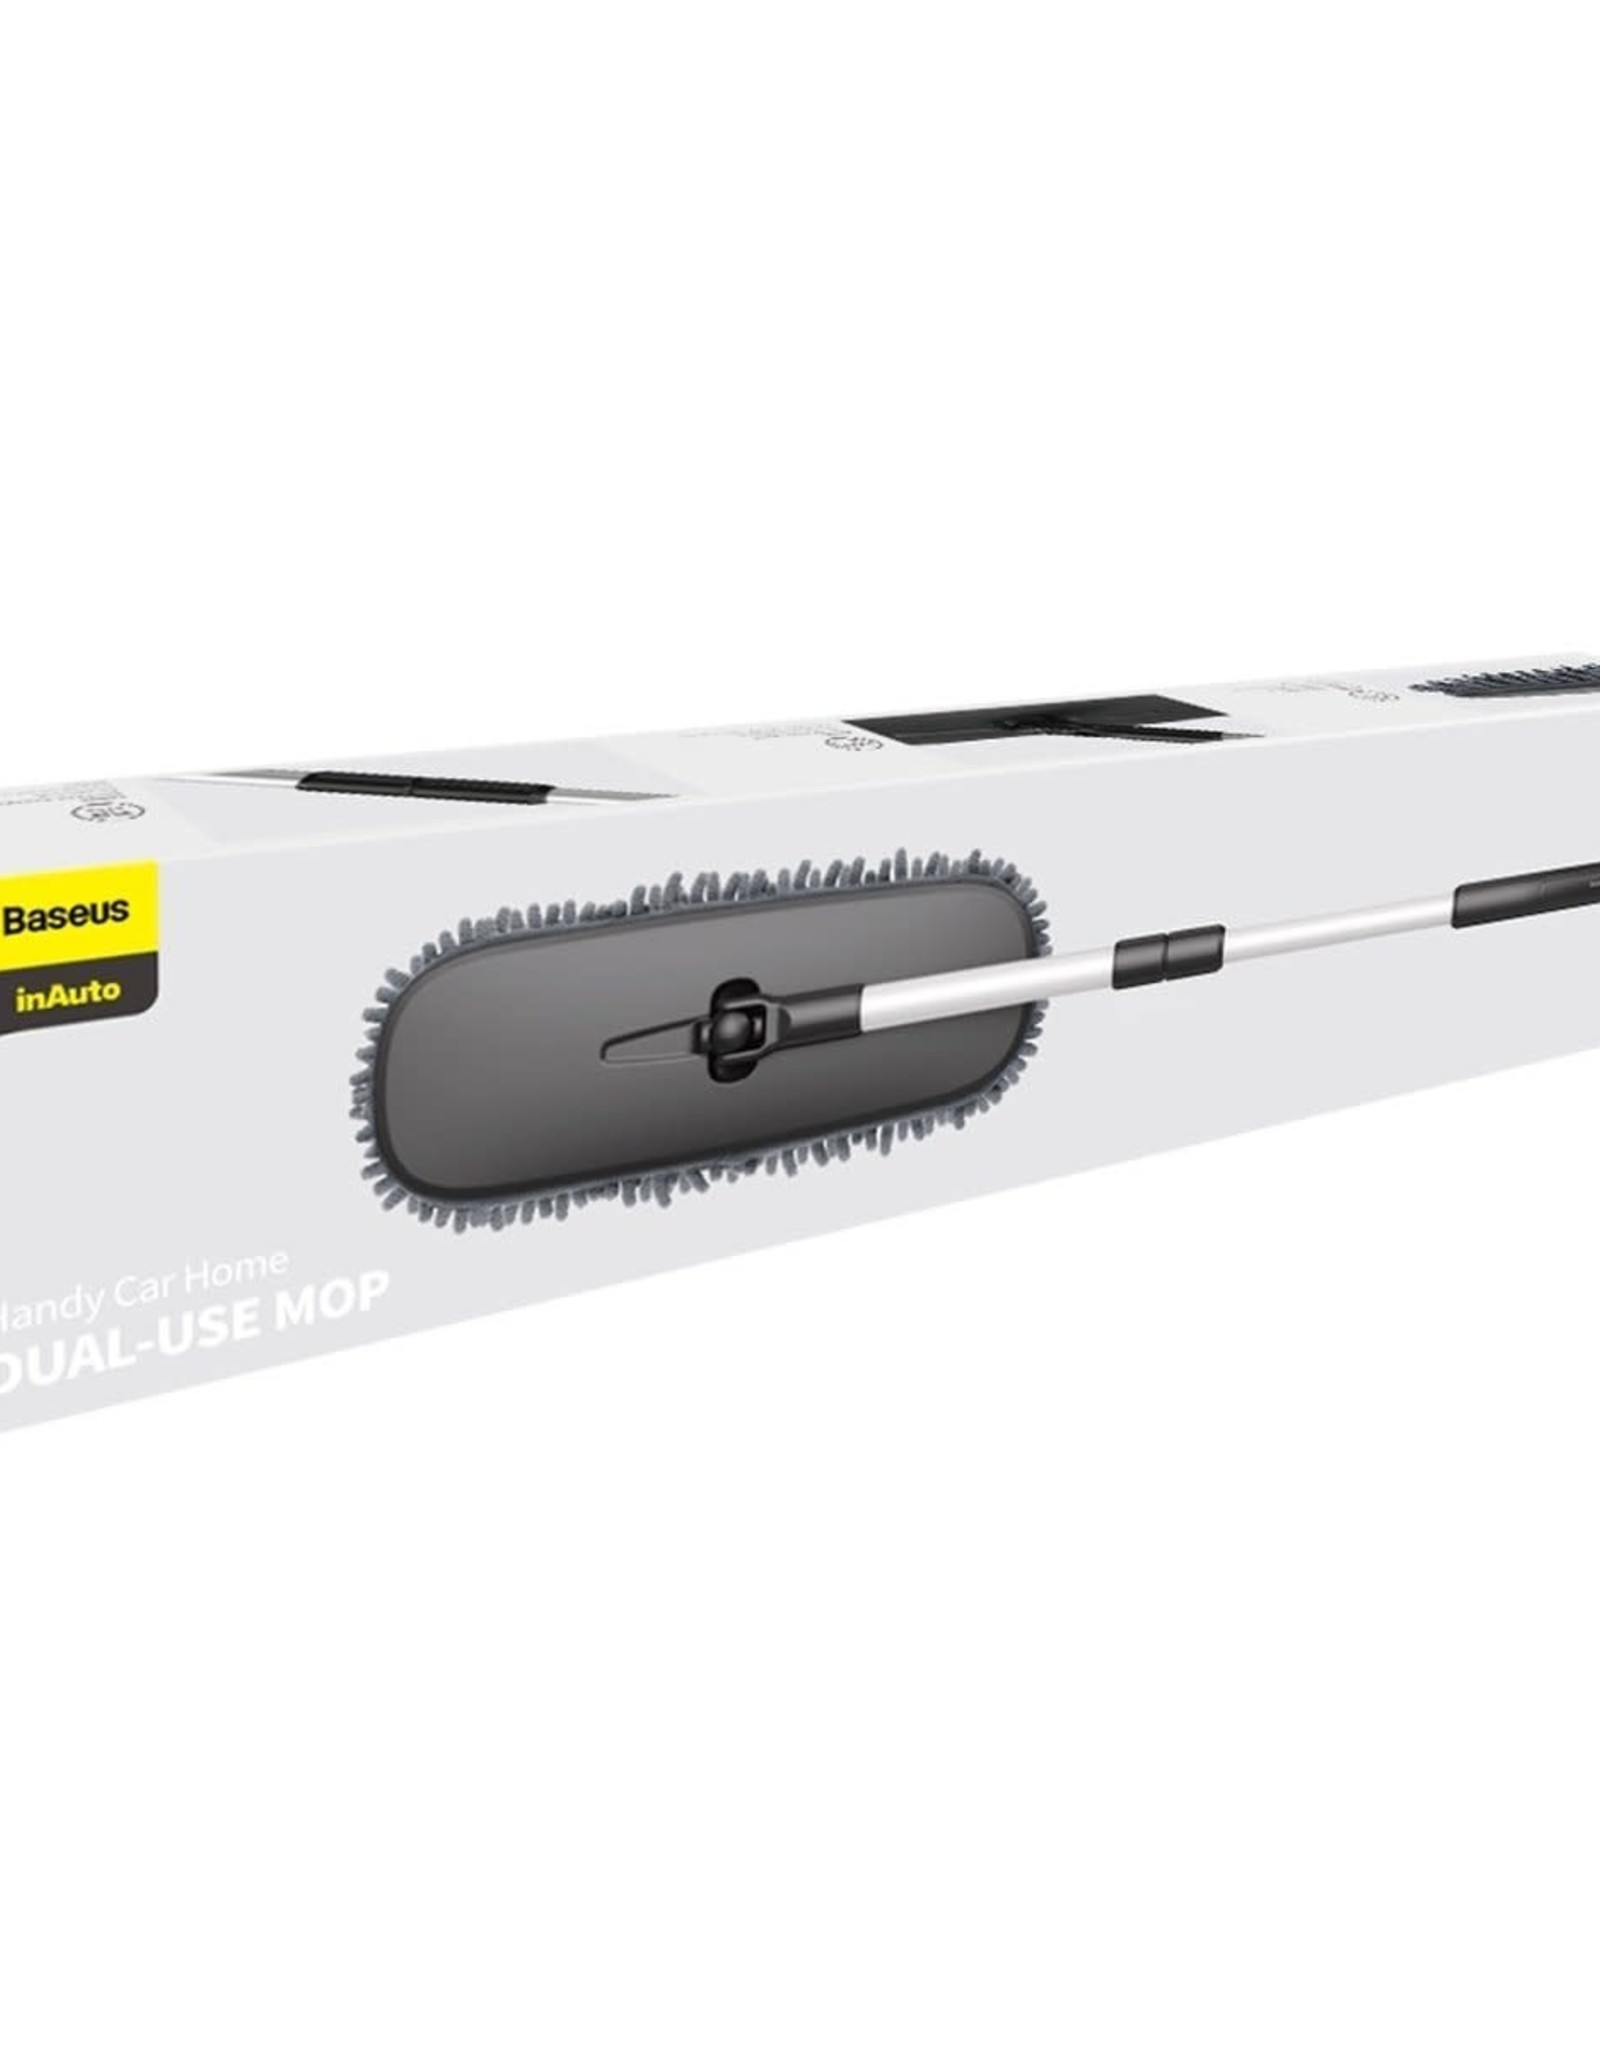 Baseus Baseus Handy Car home Dual-use Mop Black